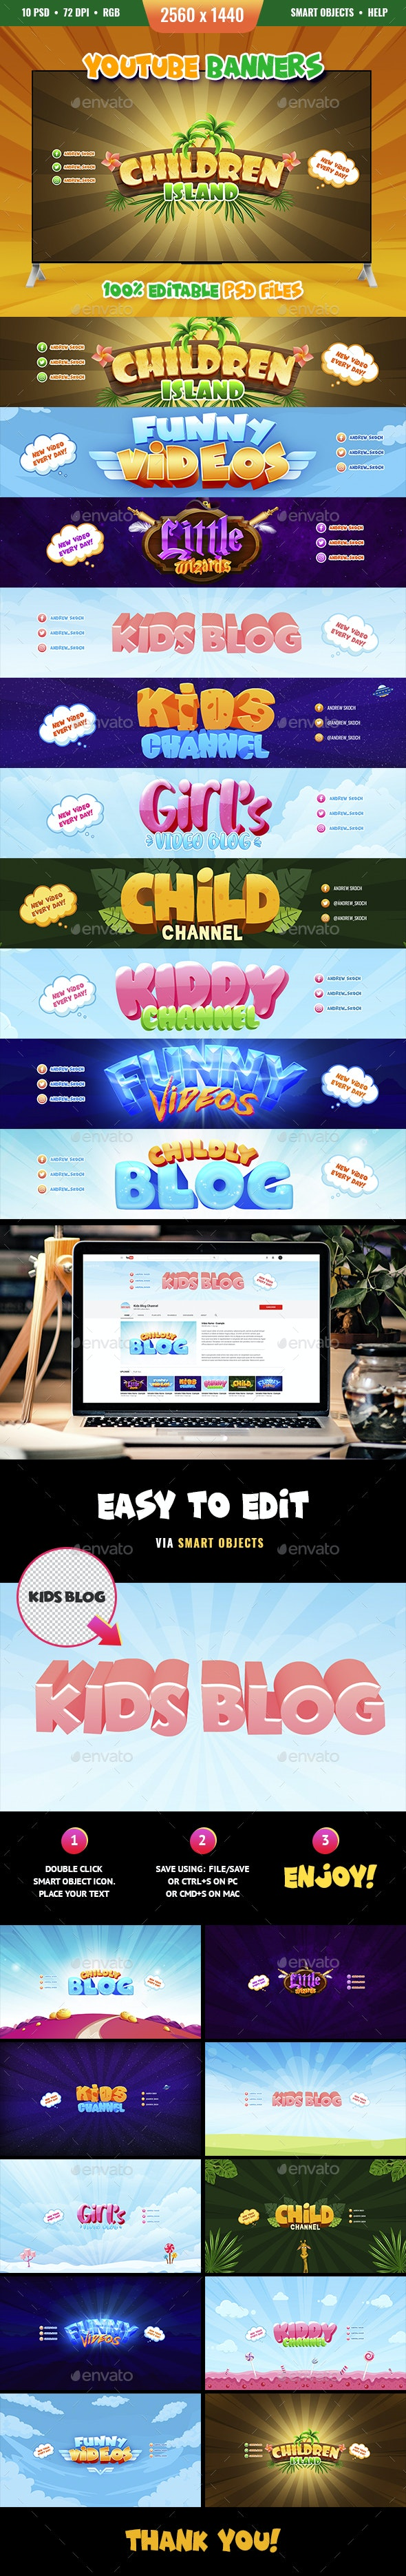 Kid Blog - 10 Youtube Banners - YouTube Social Media